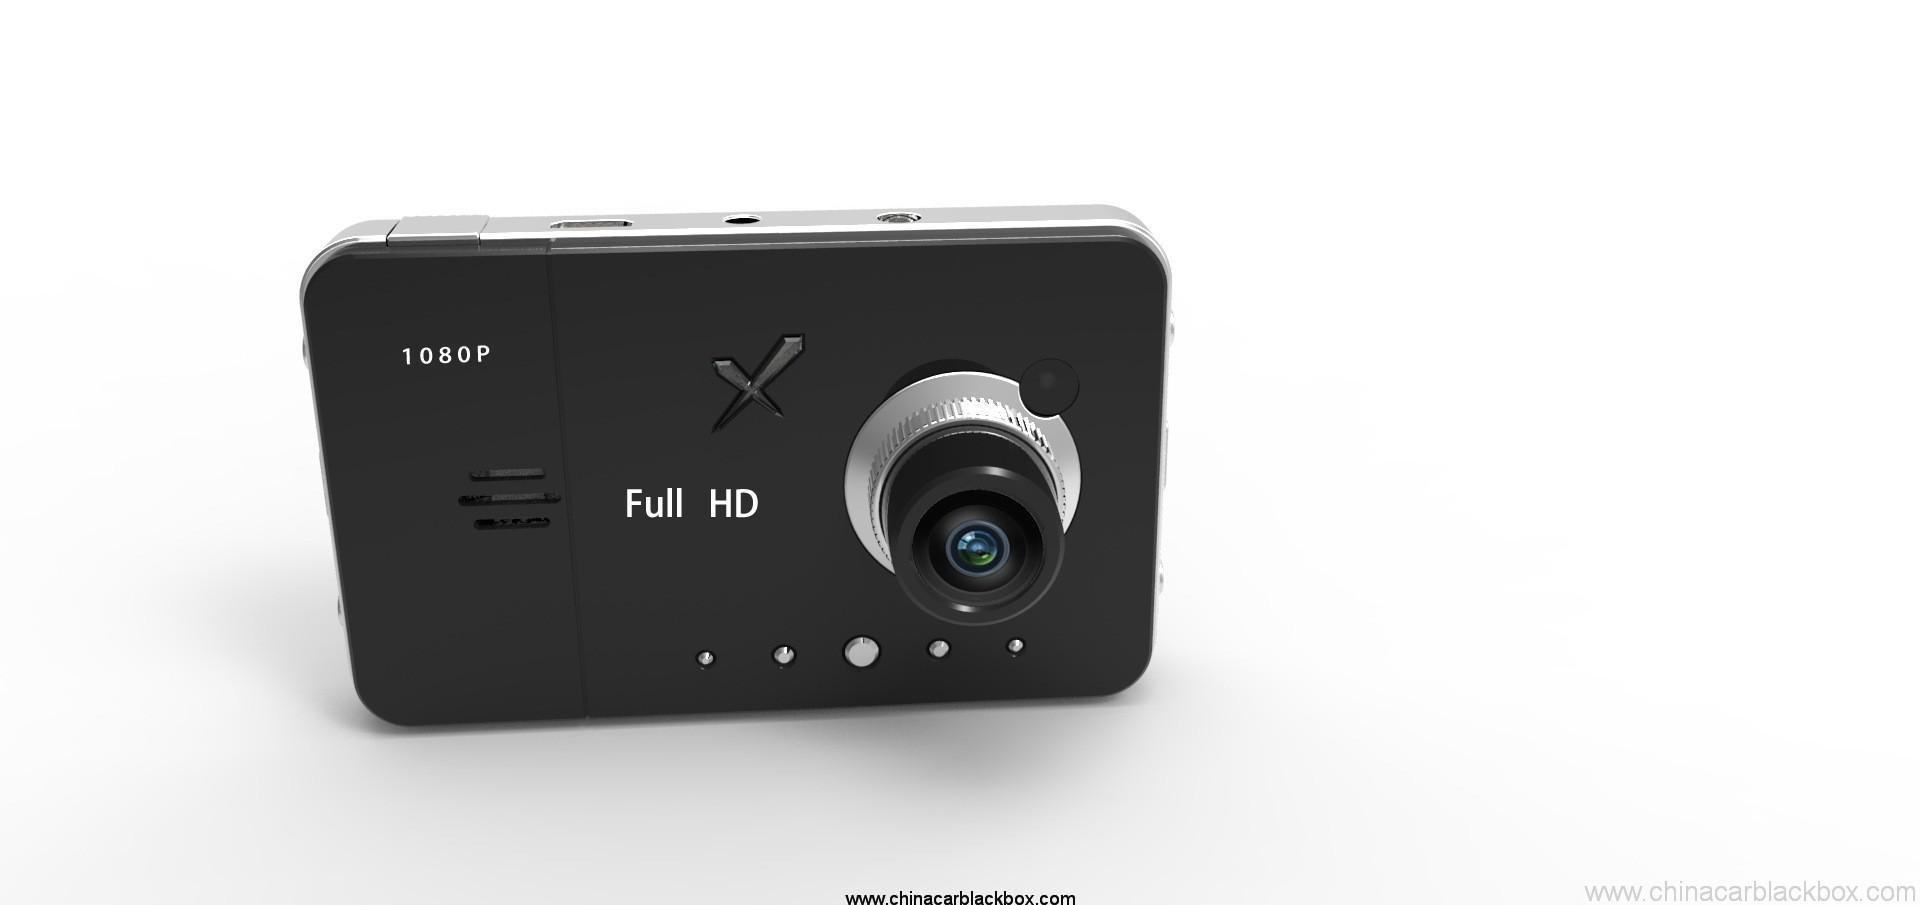 HD car dvr camera car black box with wide angle lens